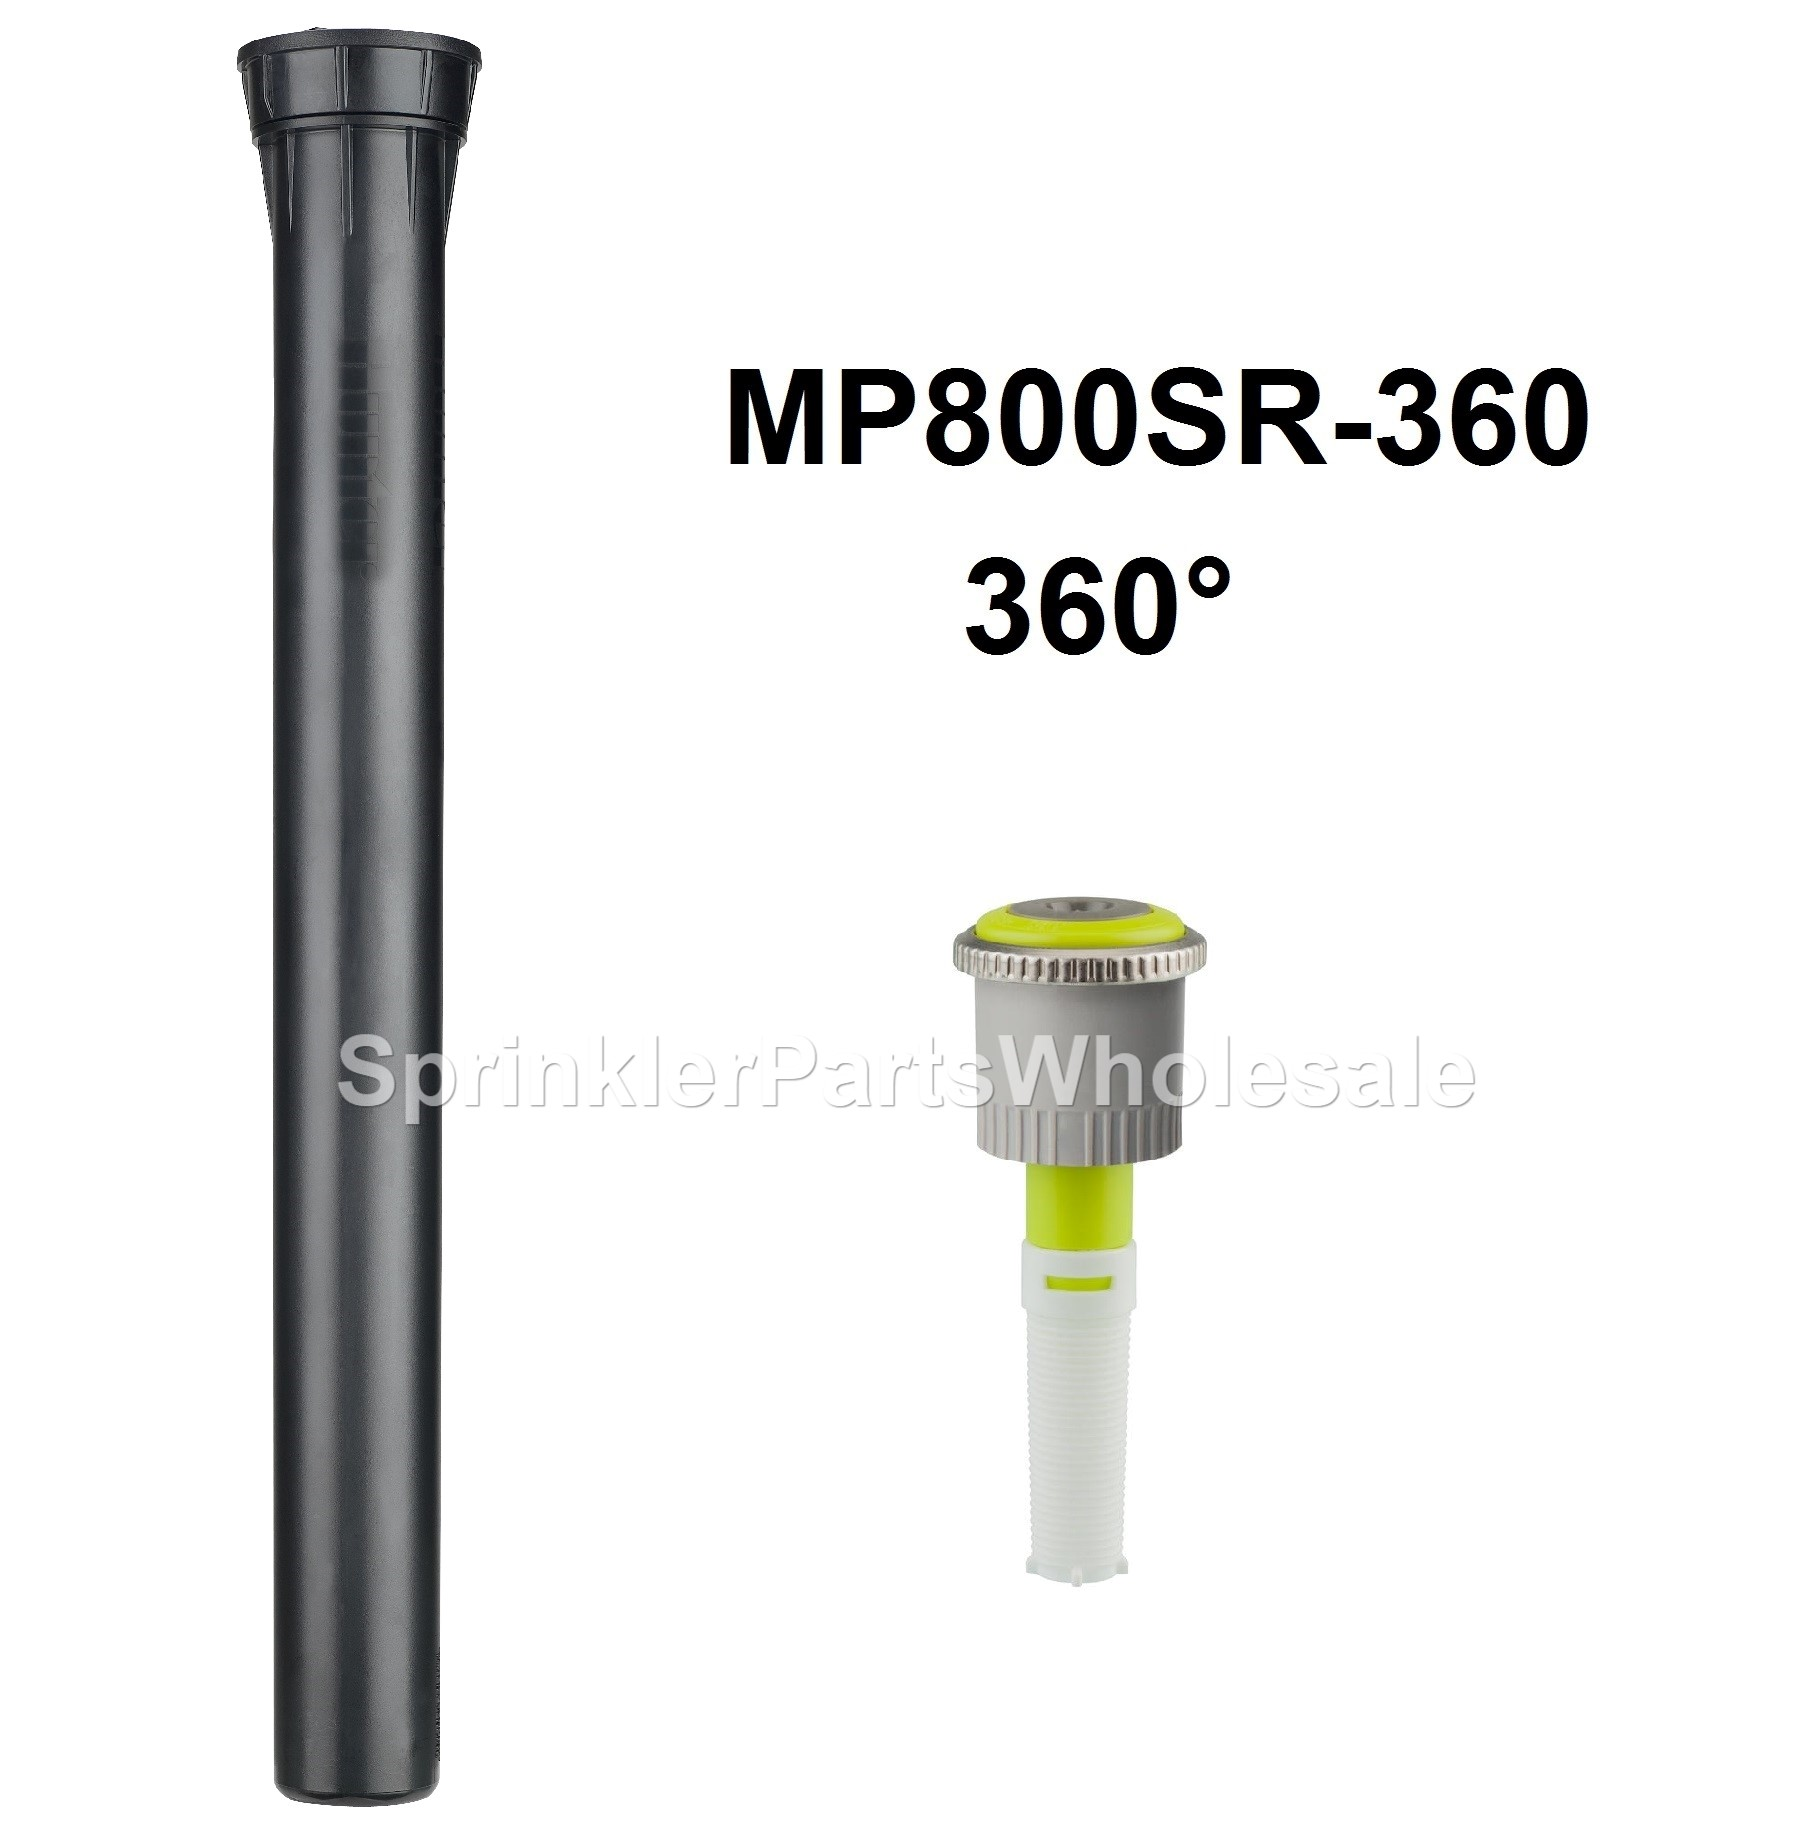 Hunter Pros 12 Nsi 12 Pop Up Pro Spray Head No Side Inlet Mp Rotator Nozzle Sr